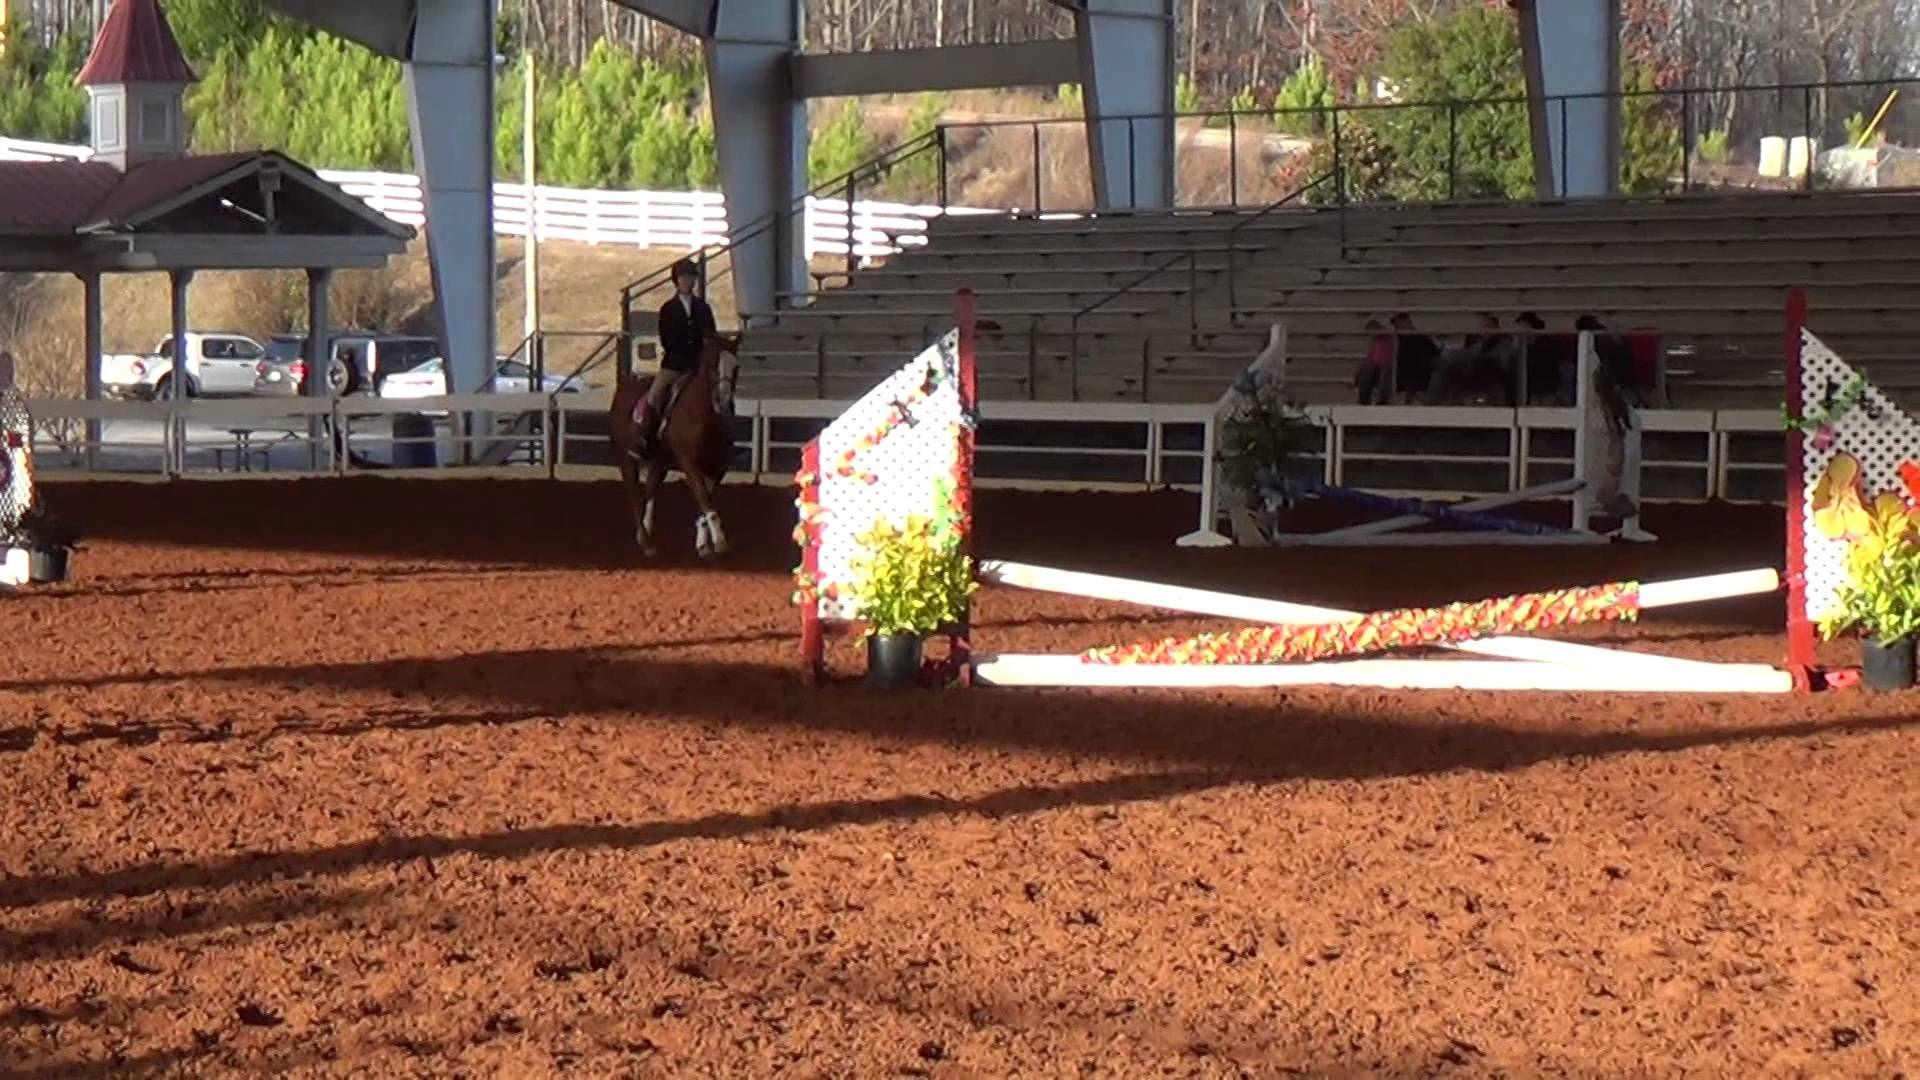 Kayla over Fences